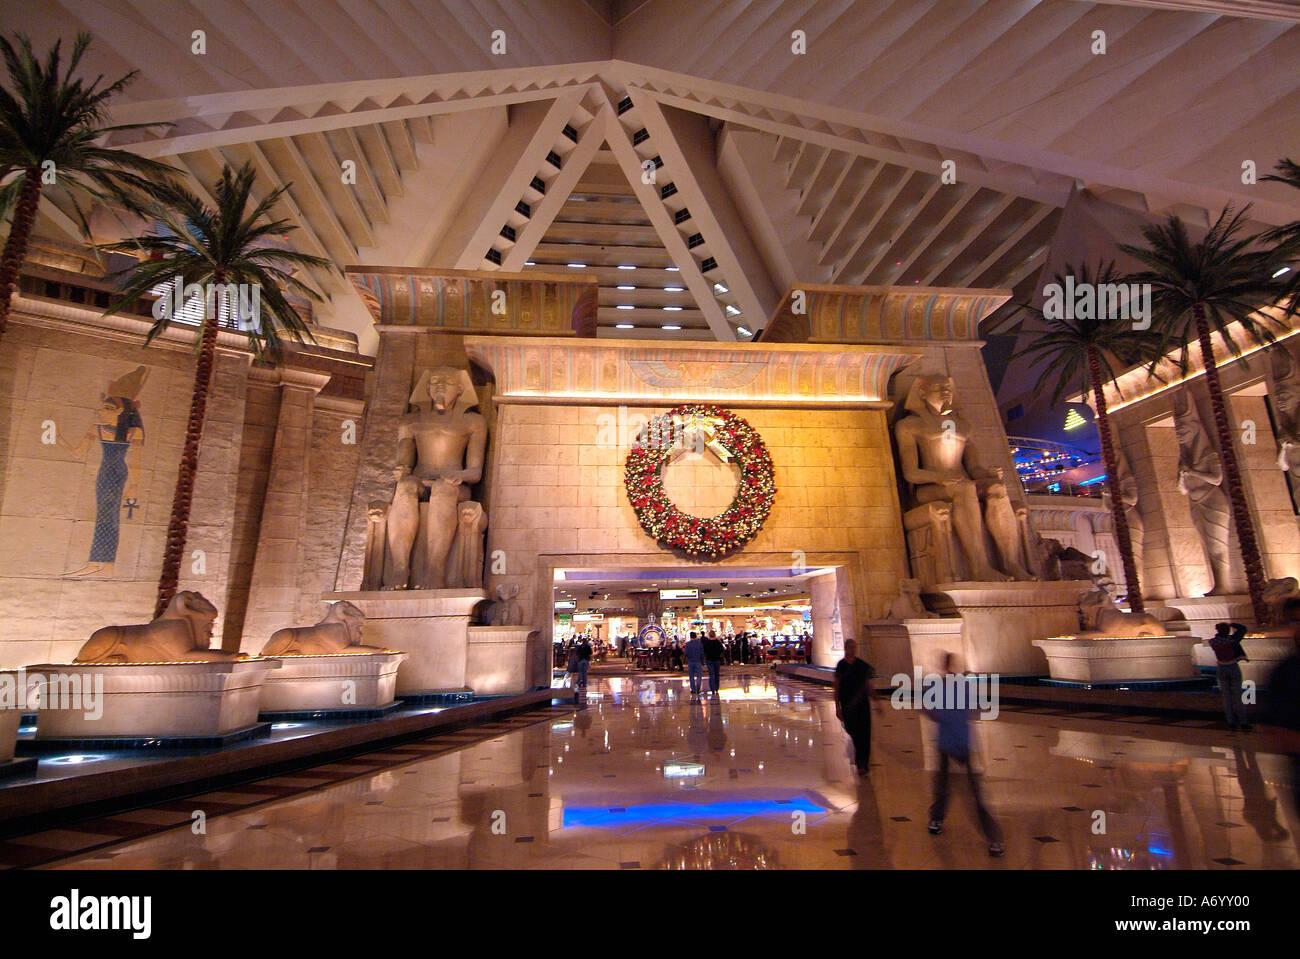 Interior of Luxor hotel Las Vegas Nevada Stock Photo, Royalty Free Image: 3813119 - Alamy